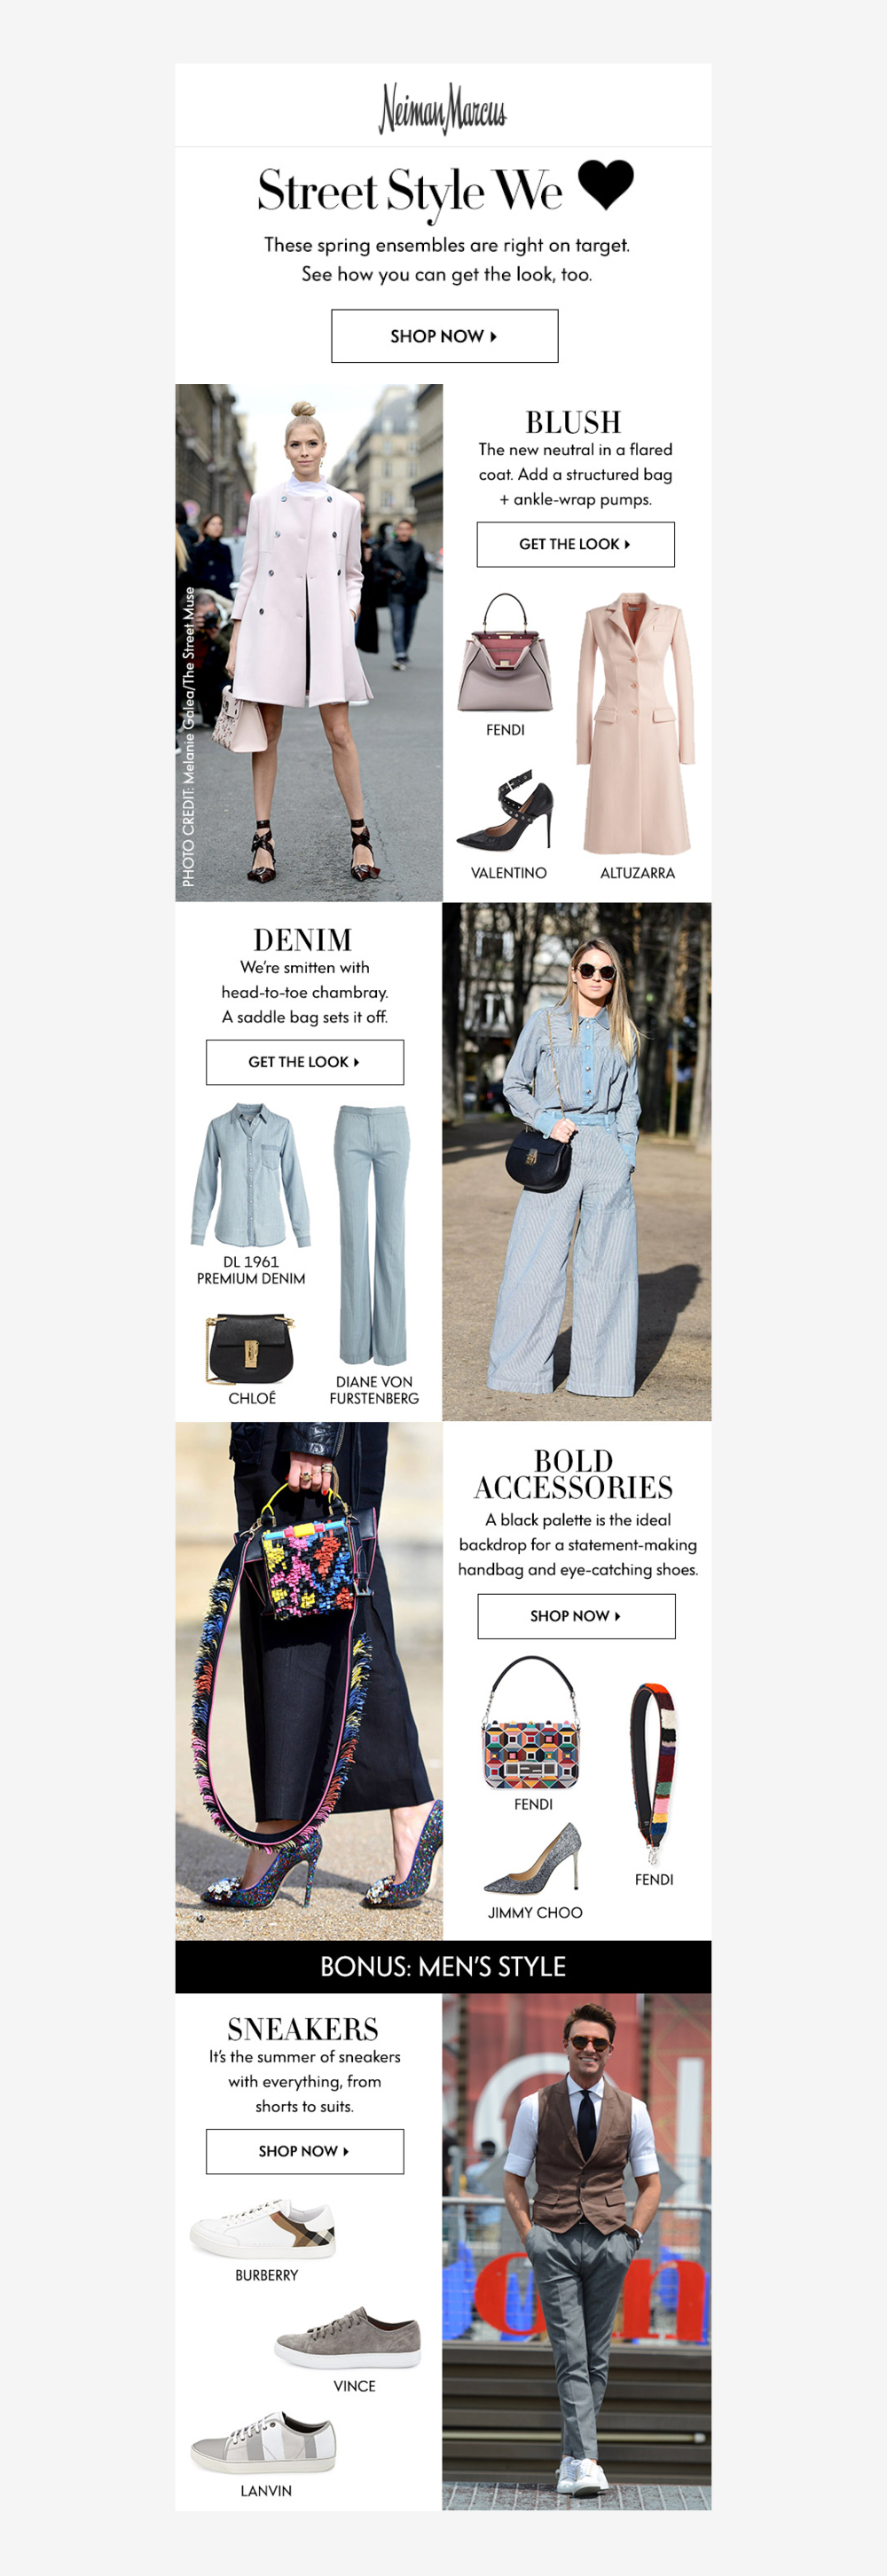 Fashion Influencers, Web Design, Jessica Oviedo